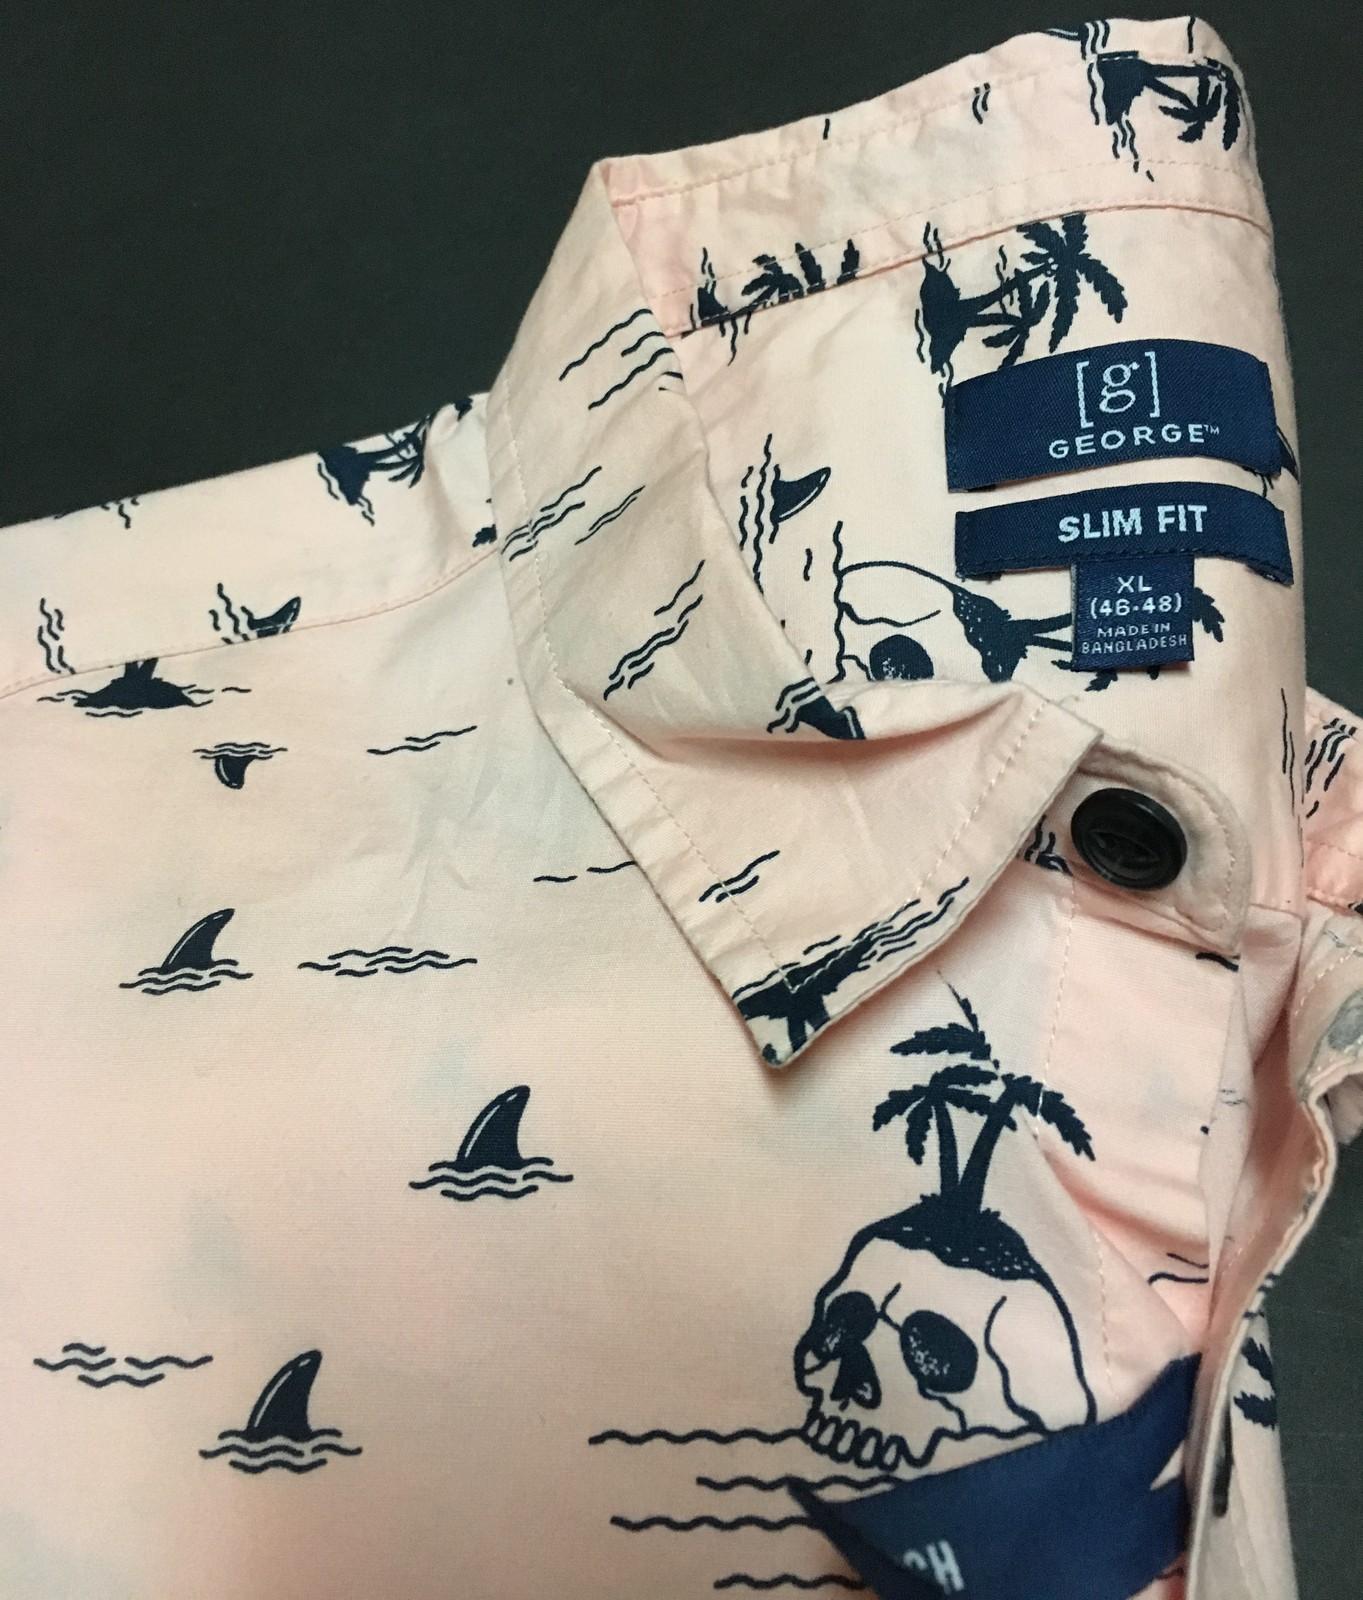 George Men's Tropical Button Down Short Sleeve Shirt Sz Slim Fit XL or L Pink